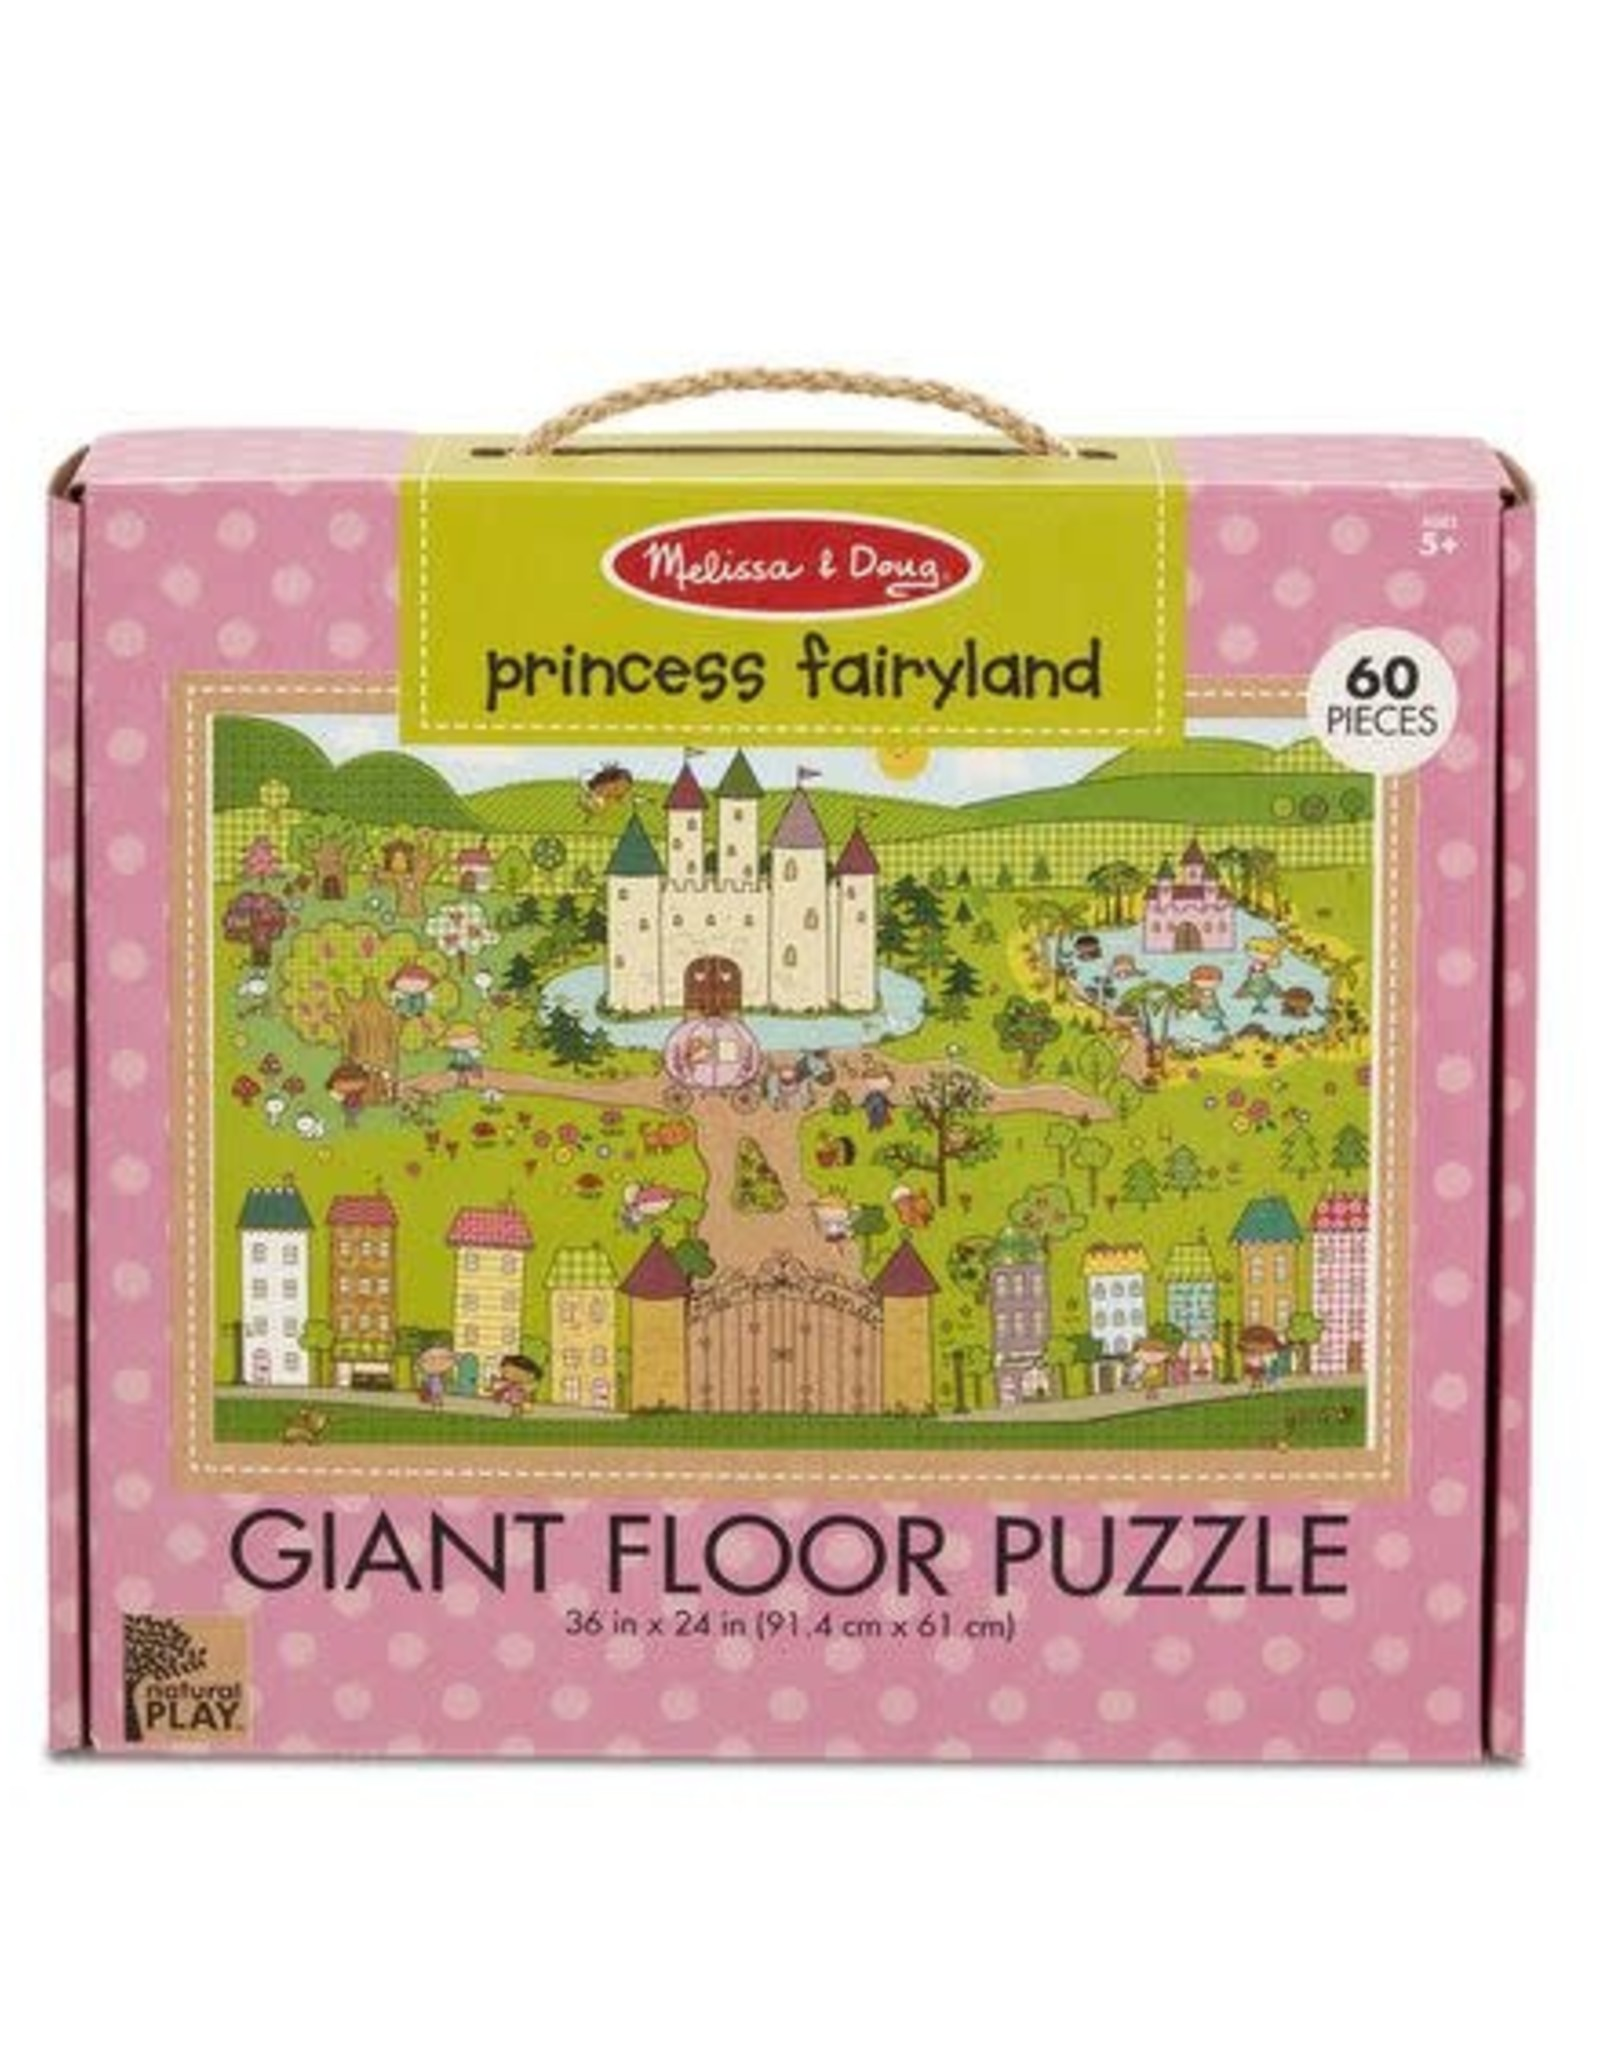 Melissa & Doug NP Giant Floor Puzzle - Princess Fairyland